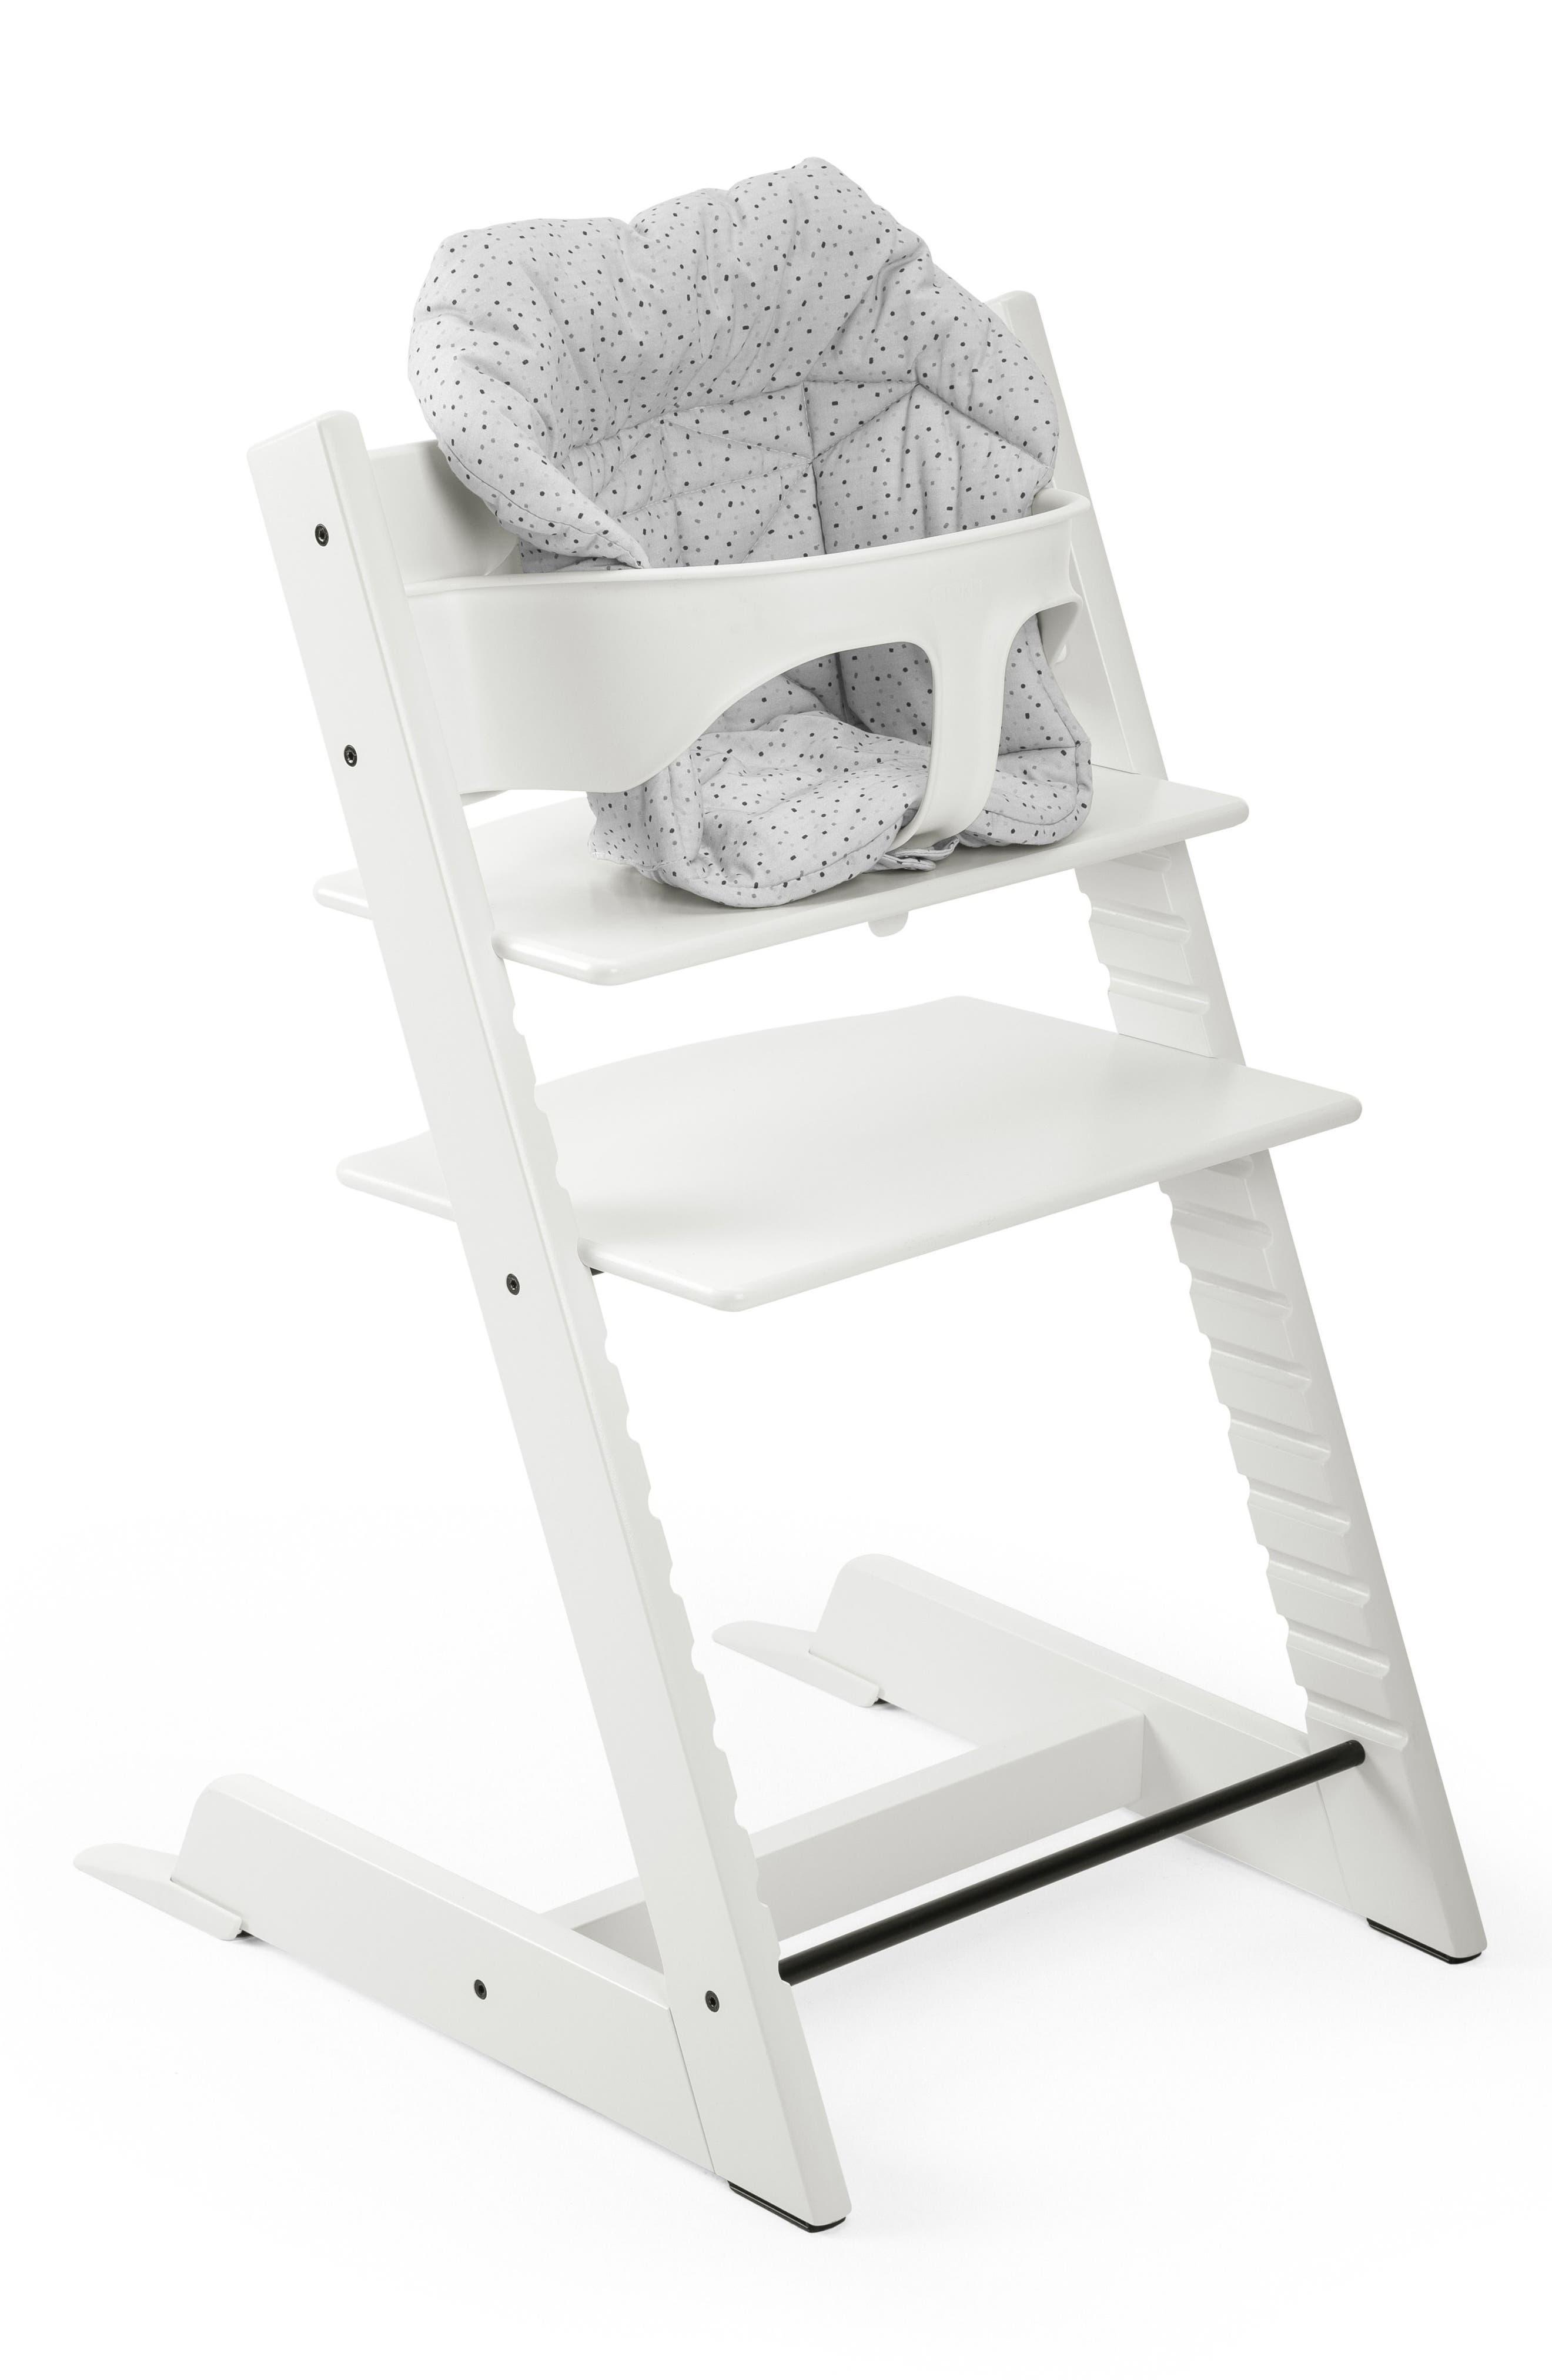 Stokke Tripp Trapp Bundle Sale Stokke Tripp Trapp Newborn Set Now  # Salon De Jardin Evolutiv